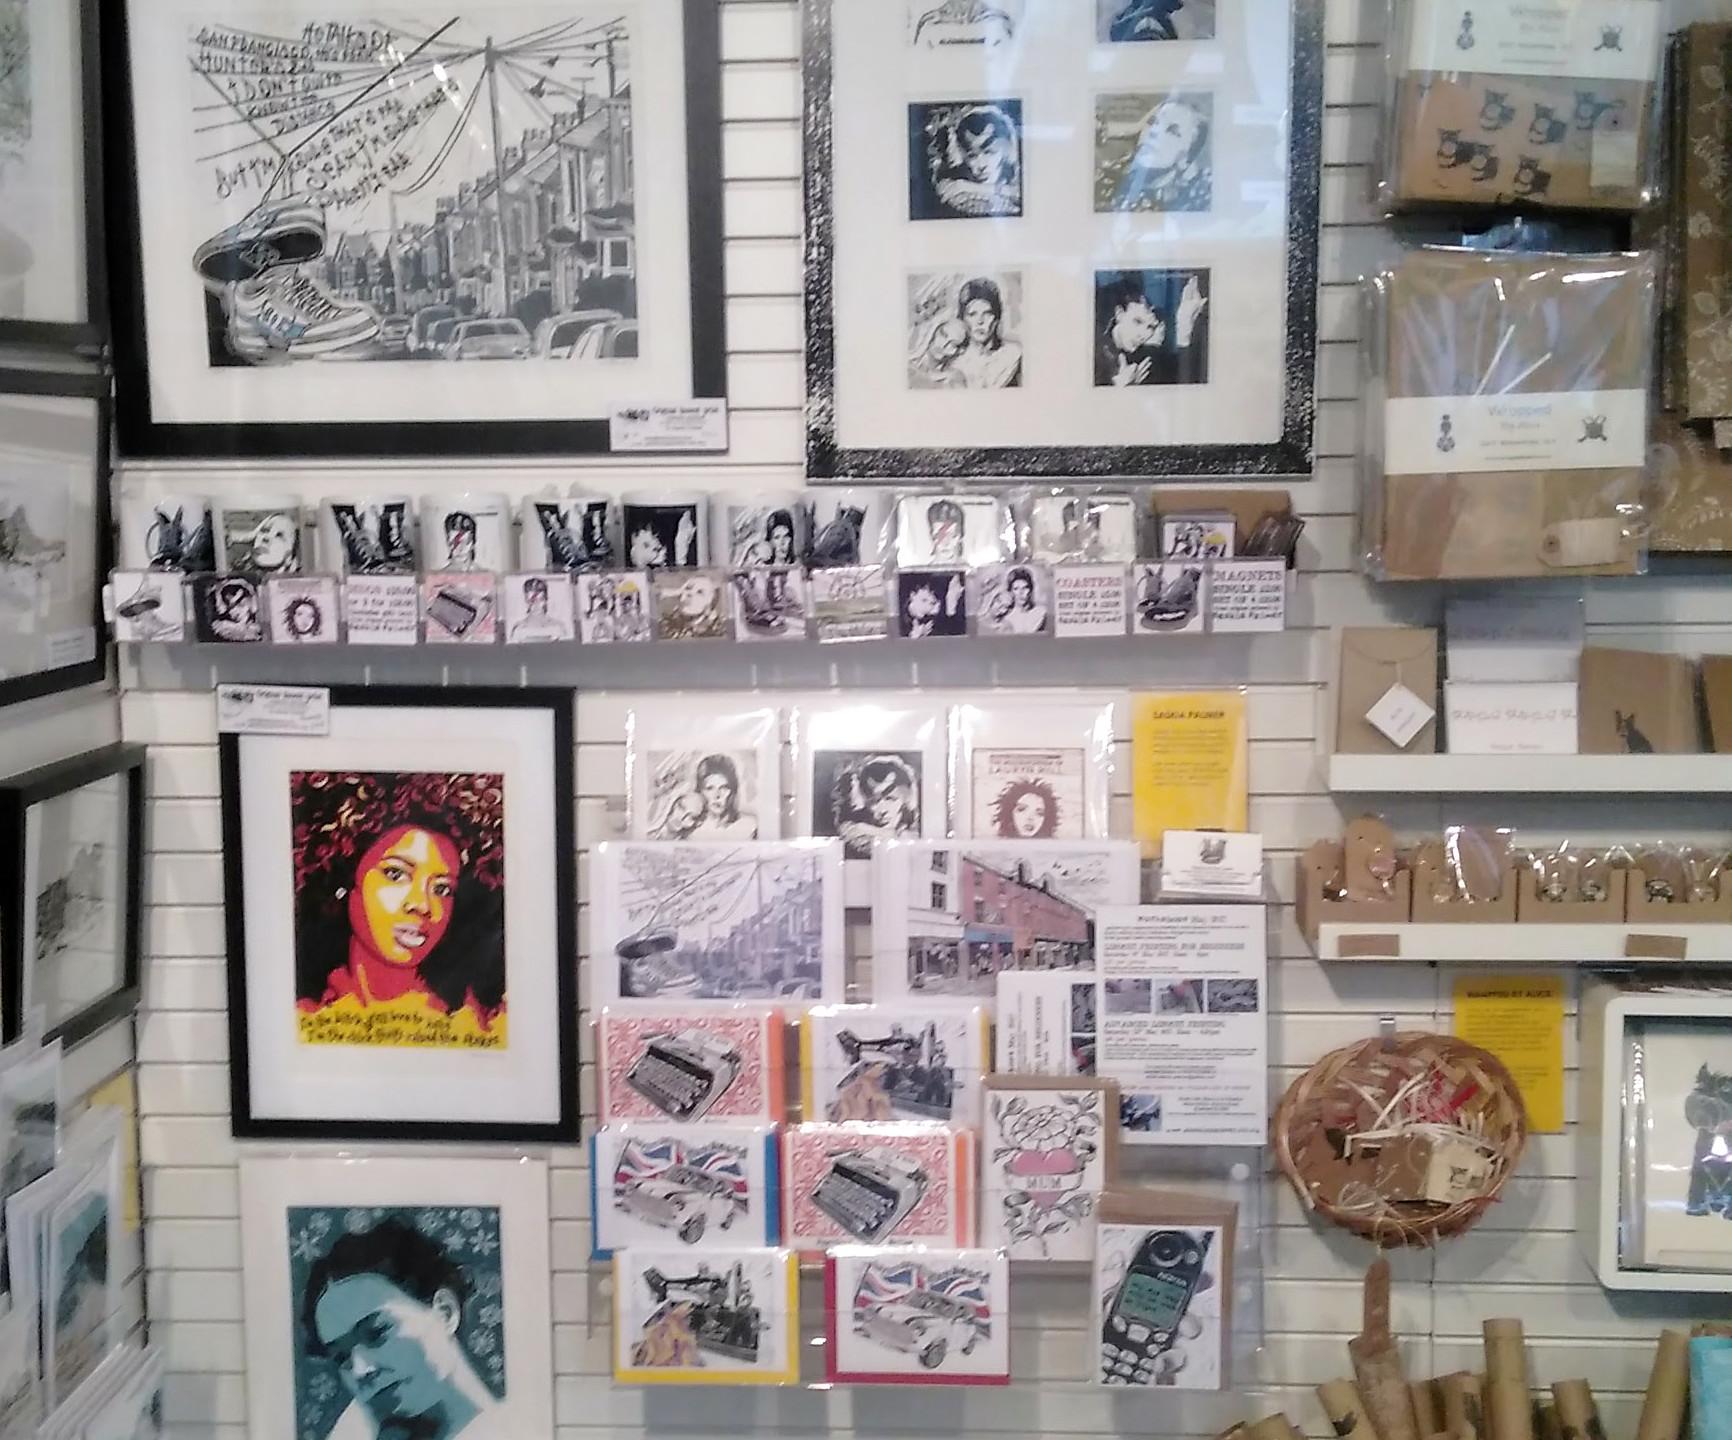 Saskia Plamer's prints